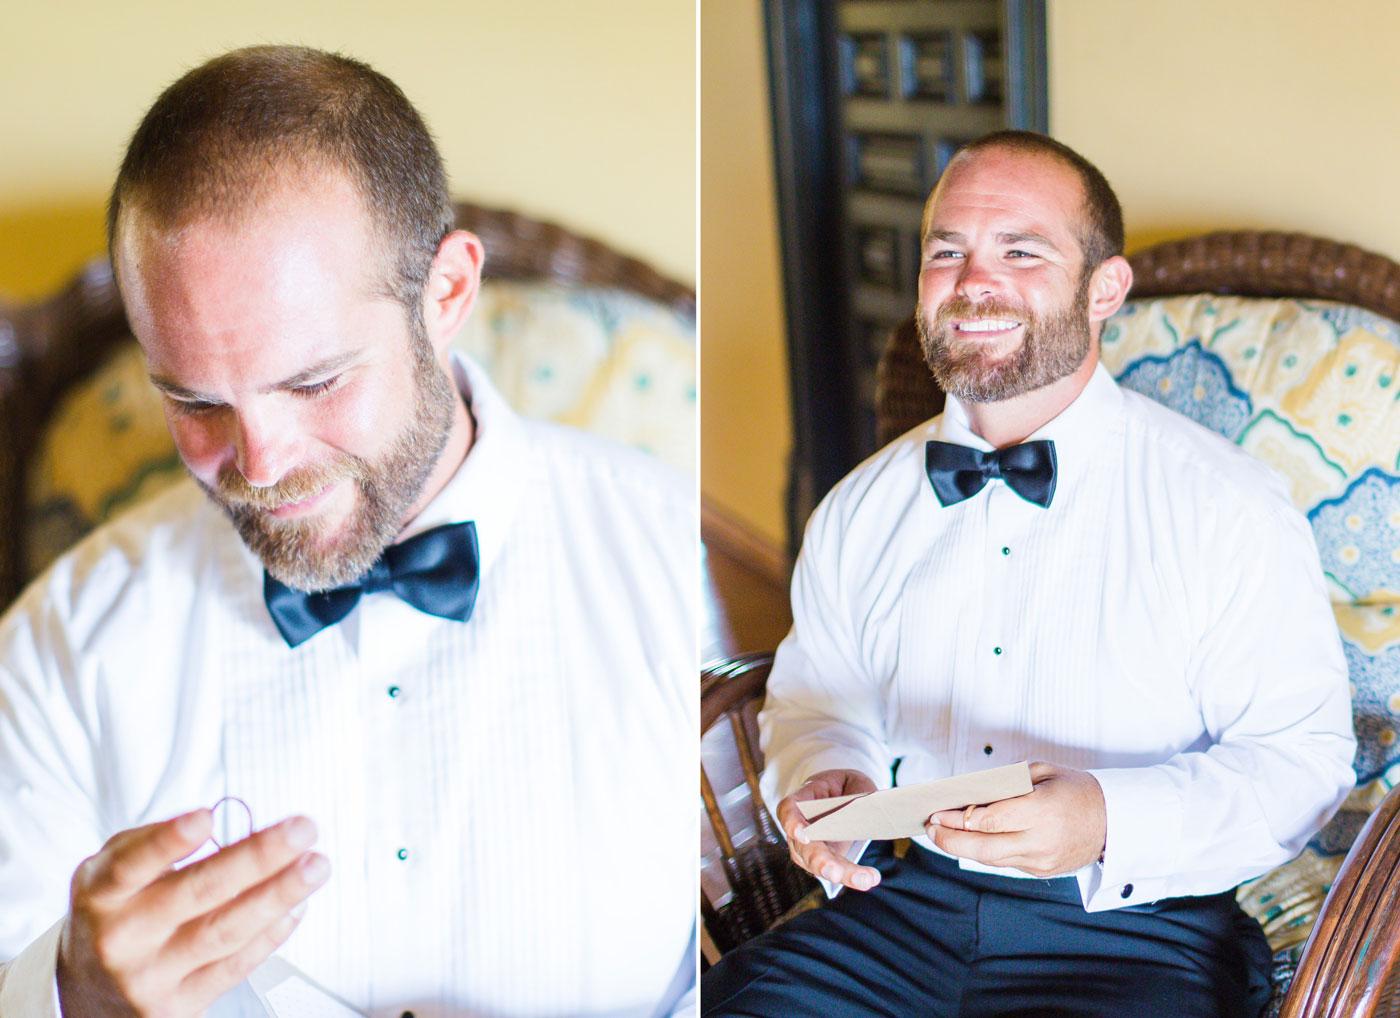 Puerto-Rico-Wedding-Photographer16.jpg